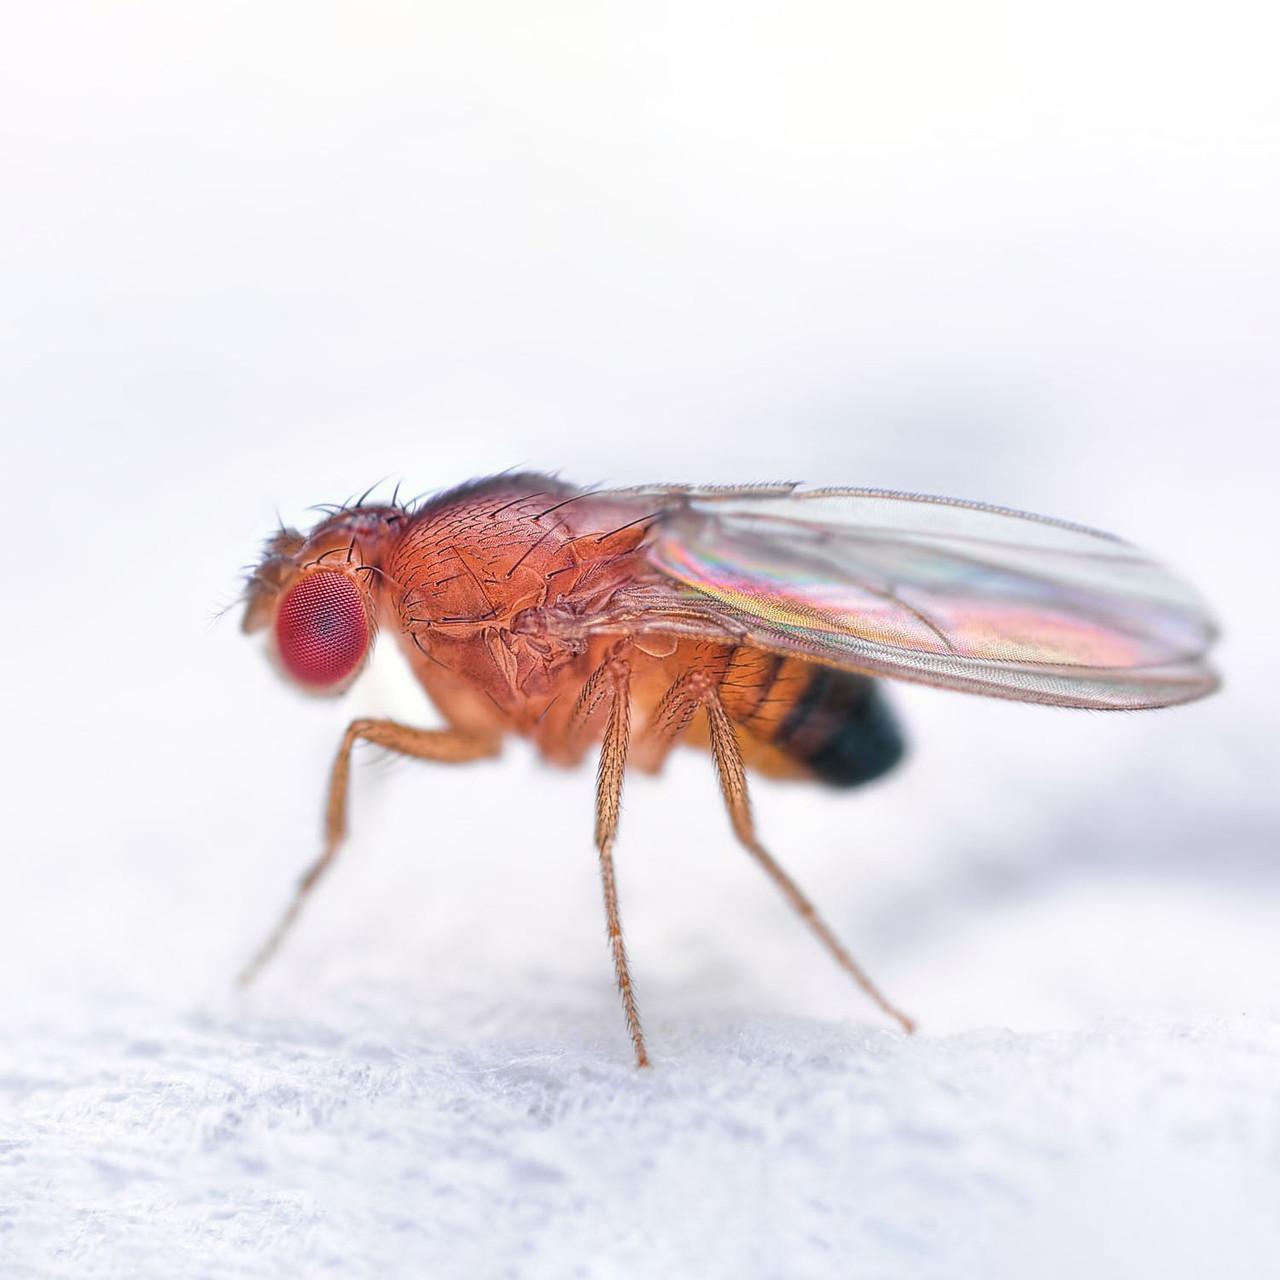 L7.4 - Drosophila, ebony body, live